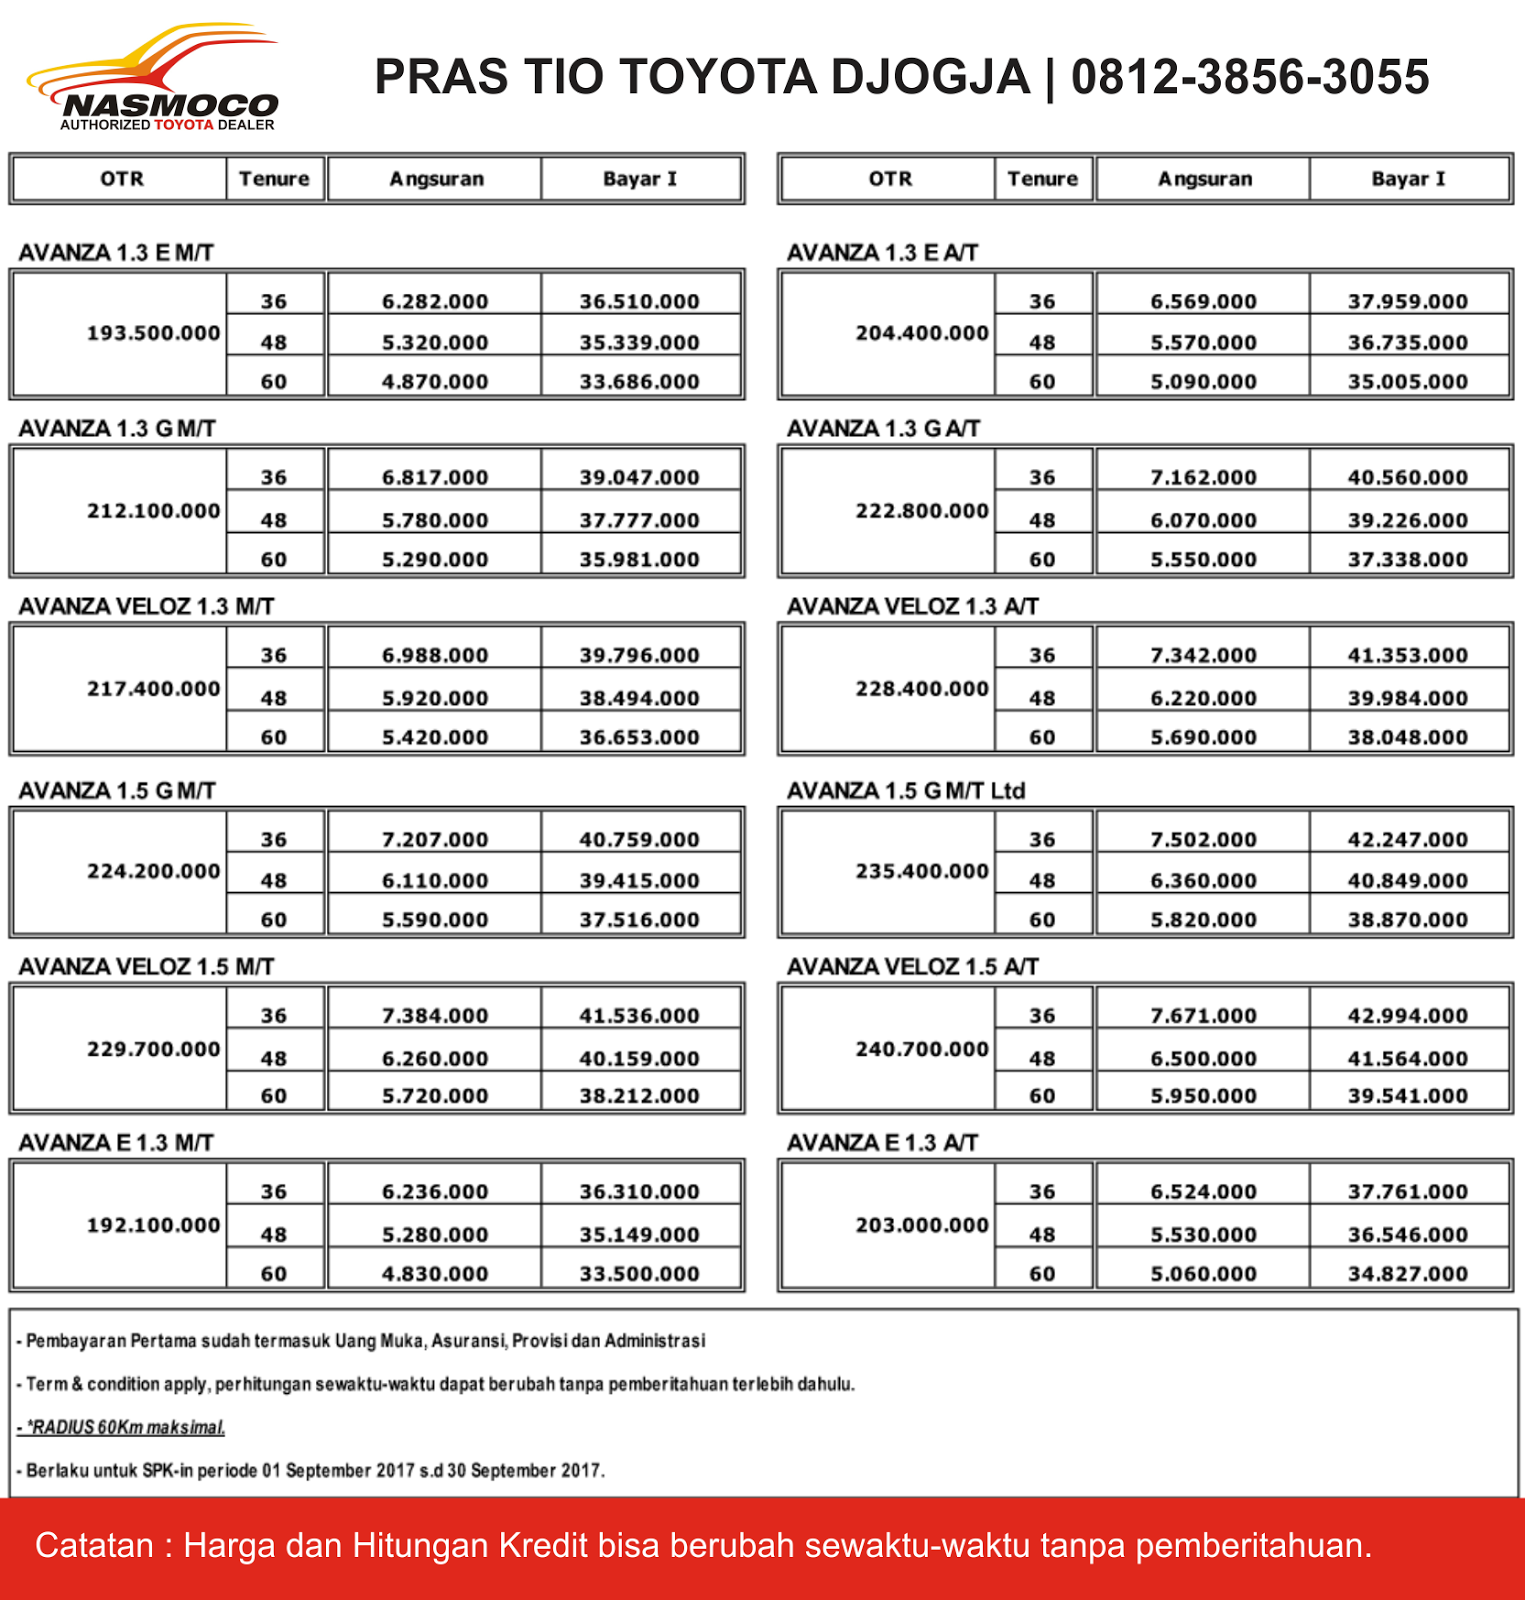 Harga Grand New Avanza 2017 Jogja All Kijang Innova 2013 Promo Kredit Termurah Jateng Dealer Toyota